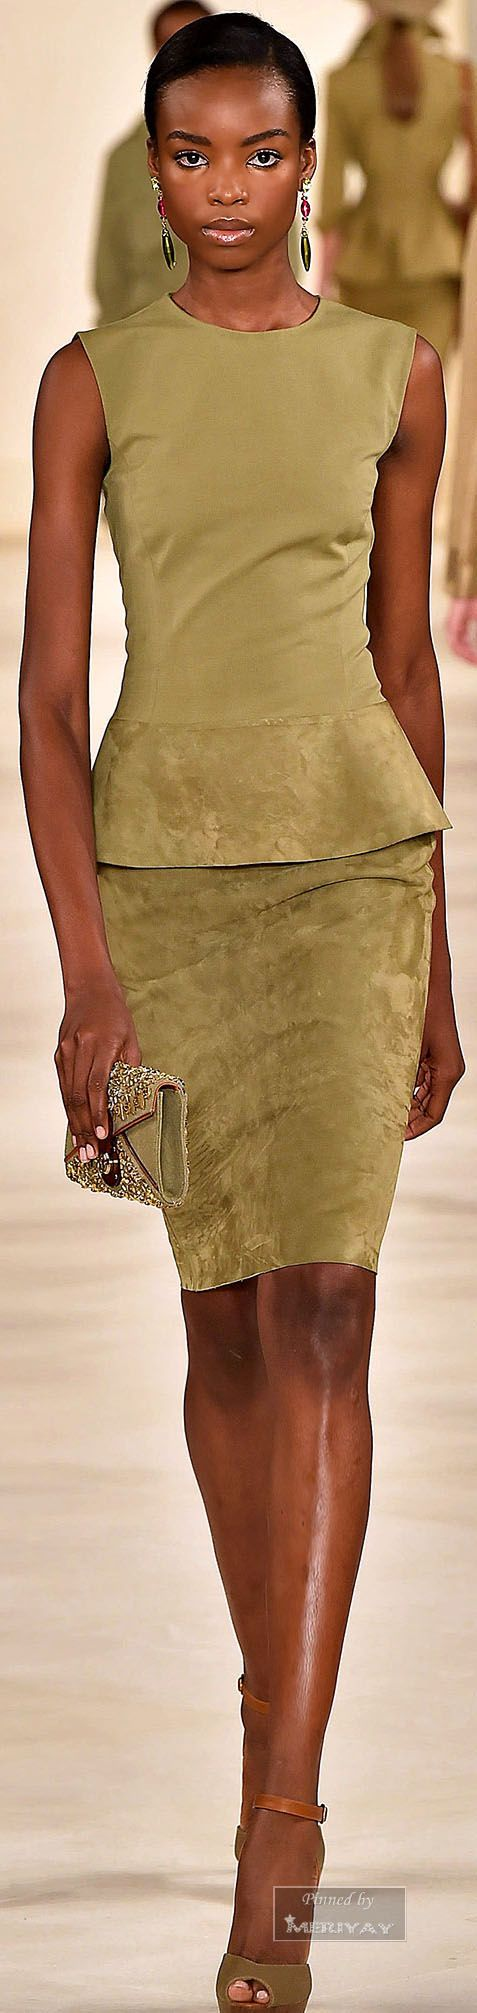 Olivfarbenes Wildleder bei Ralph Lauren - sehr sophisticated #olivefashion #greenfashion #springsummer2015